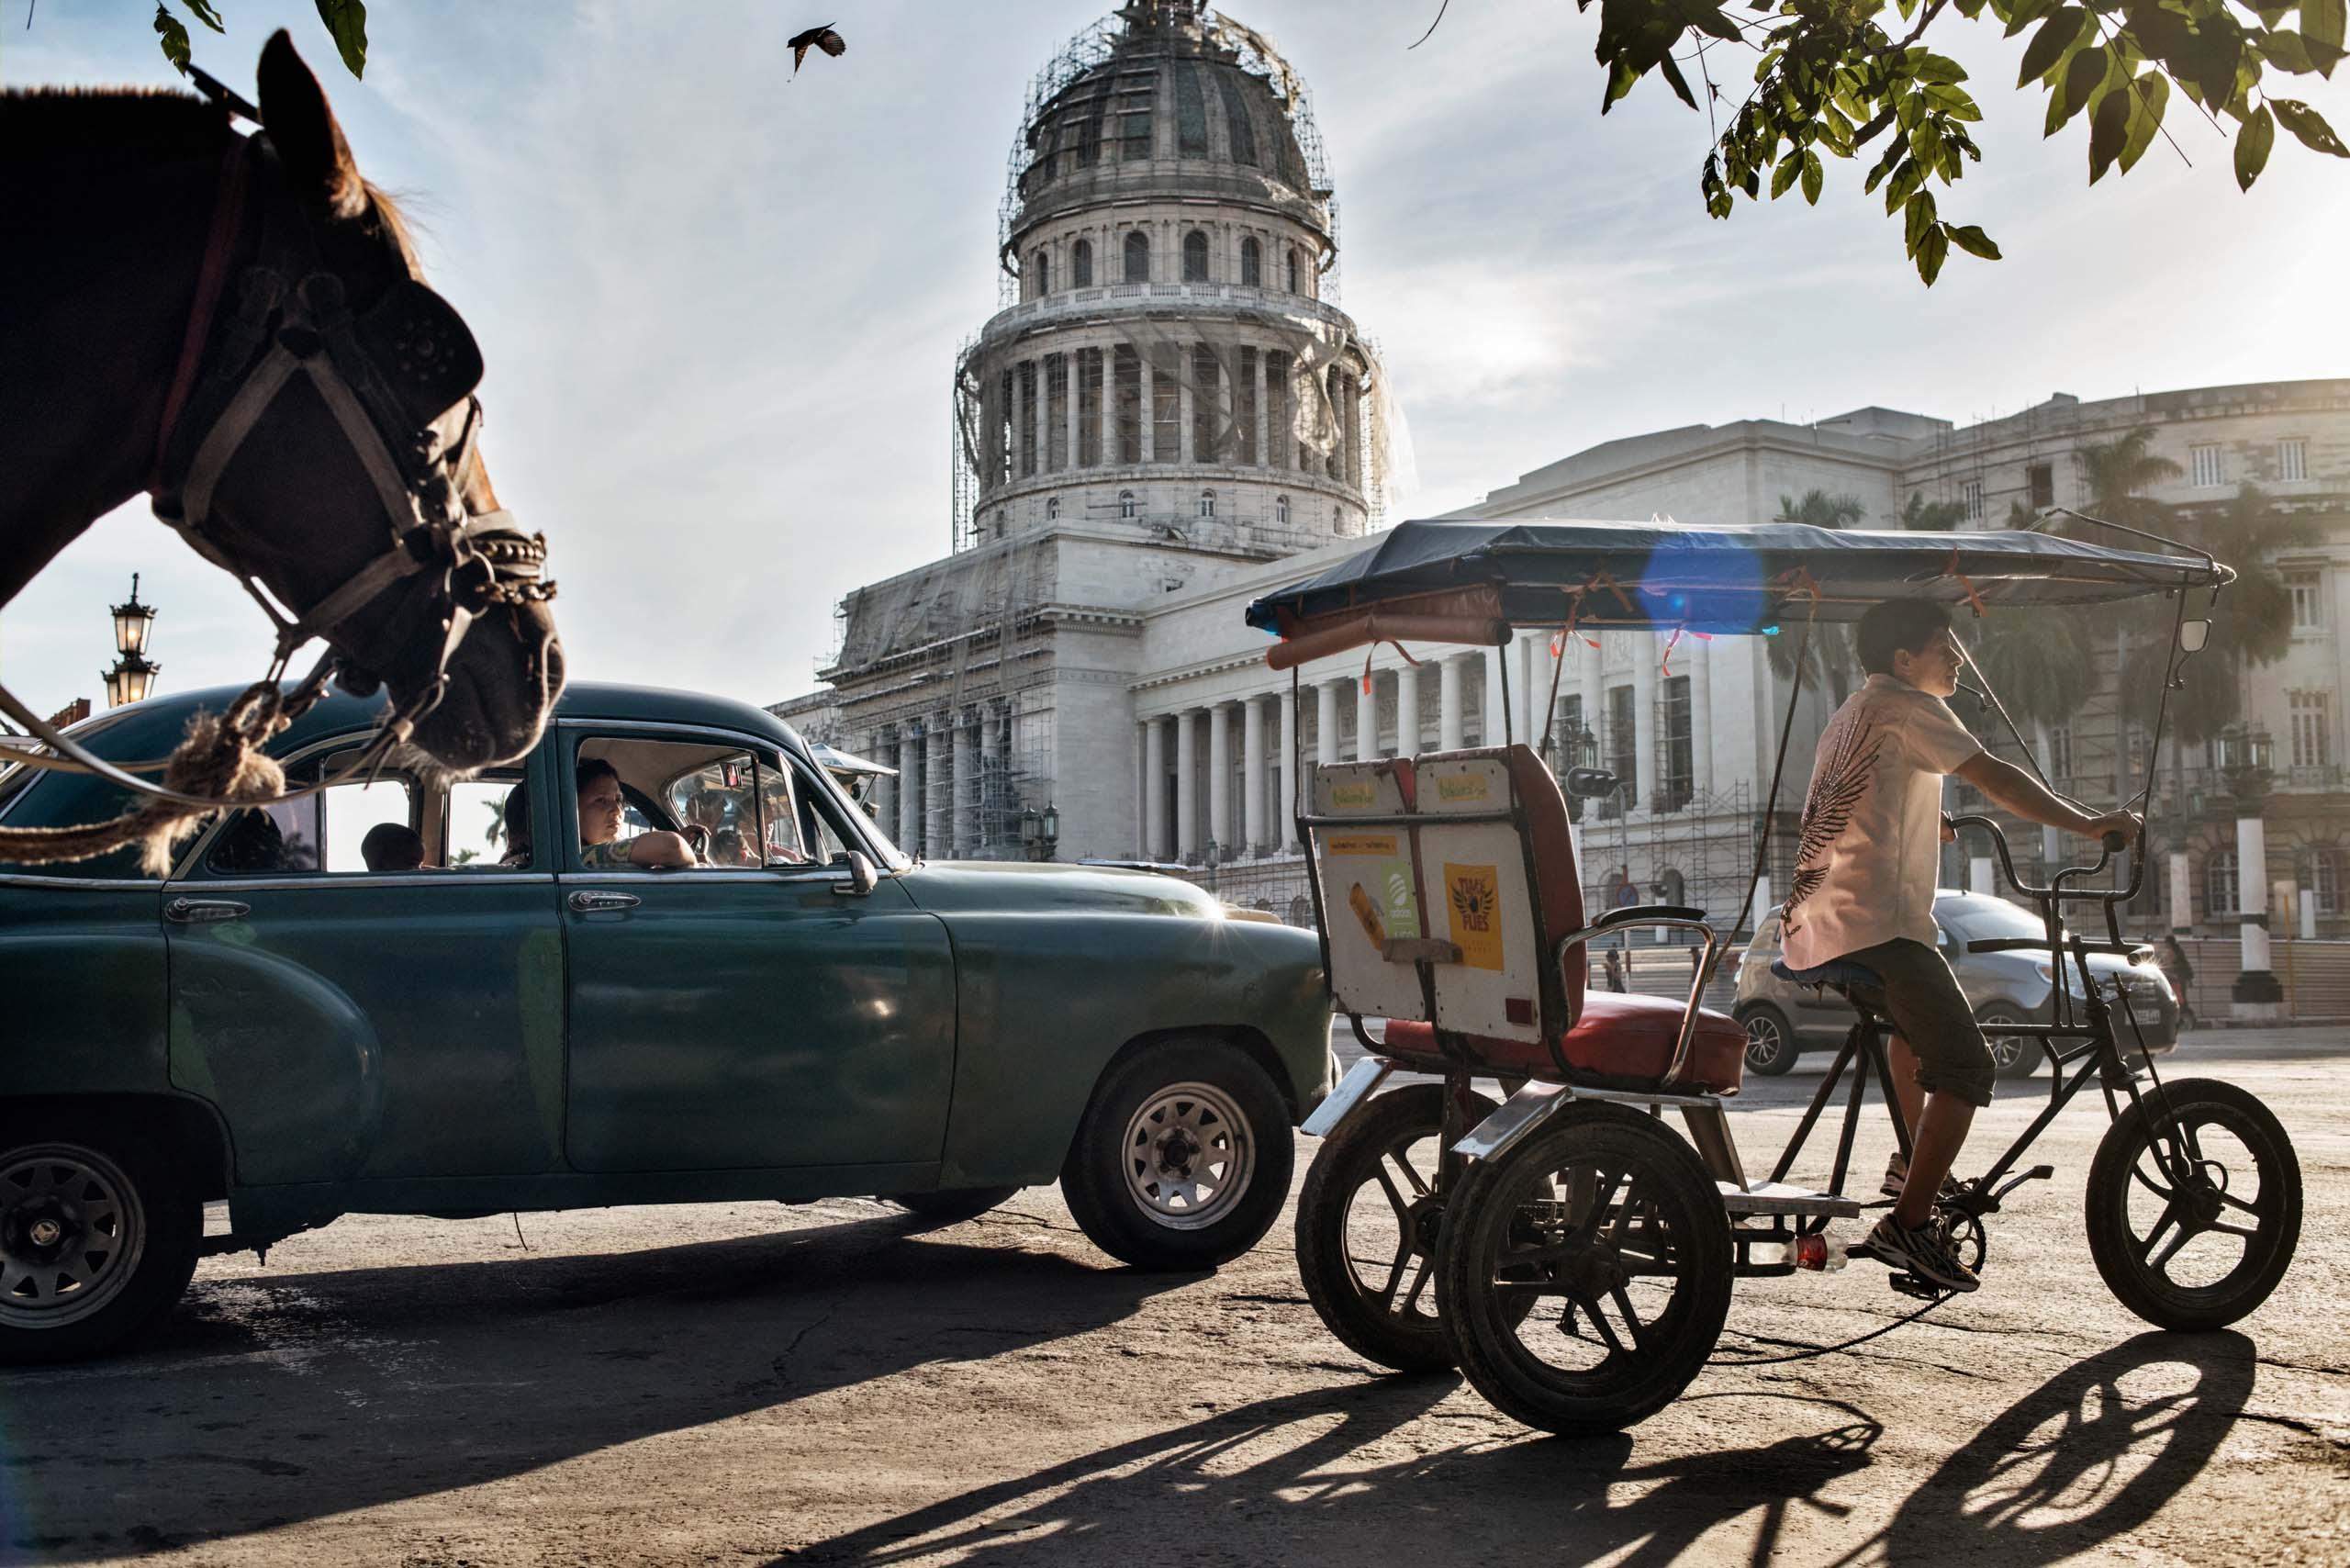 TIME LightBox: CubaThe National Cuban Capitol Building in Havana is seen during restoration work. December 2014.